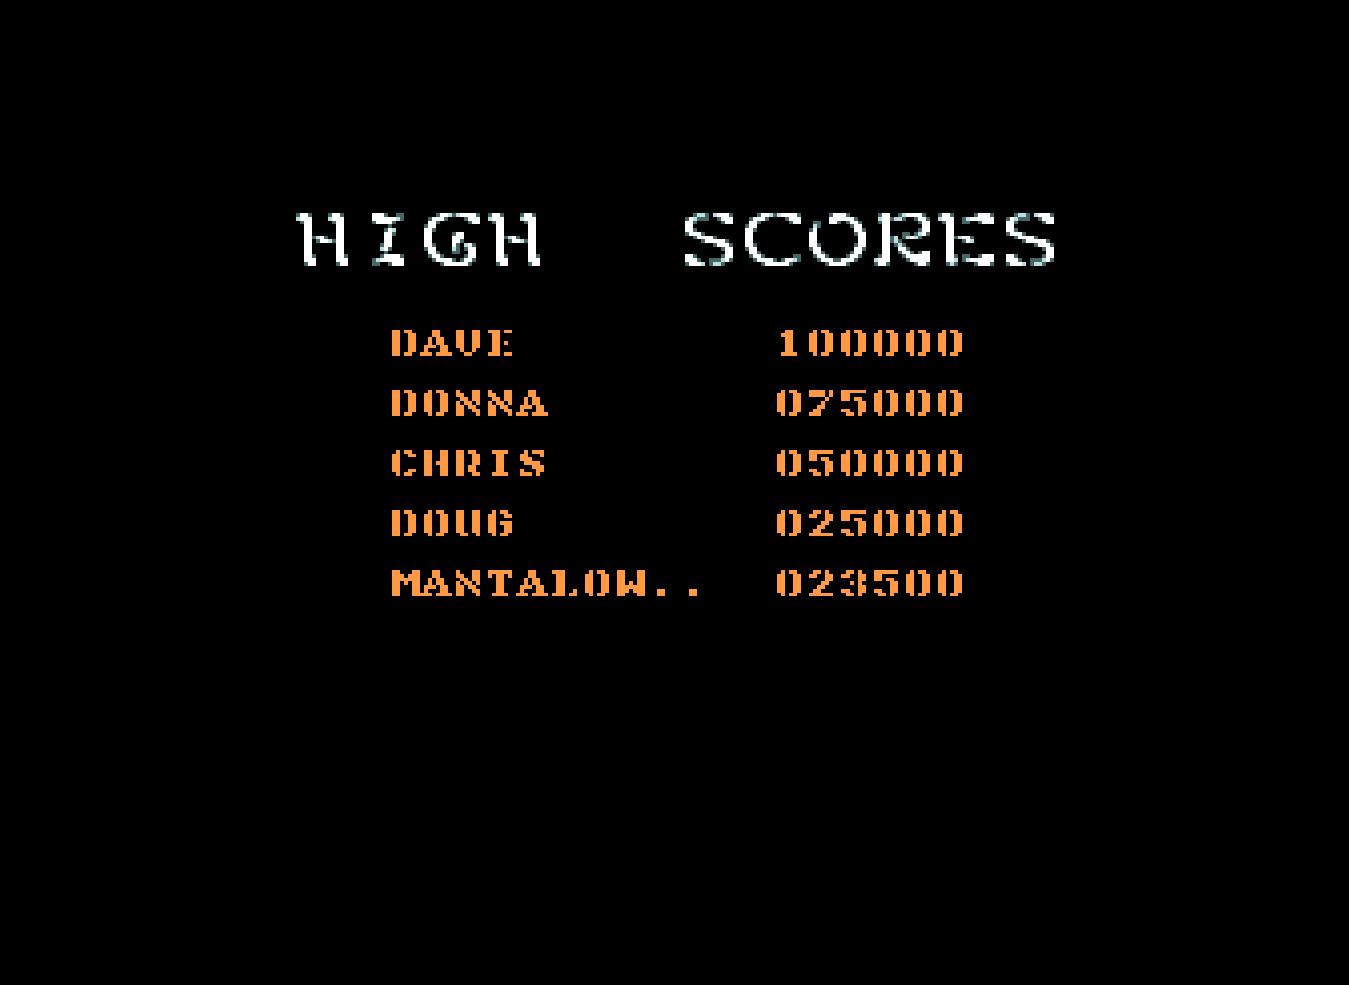 Mantalow: Kid Gloves 2 (Amiga Emulated) 23,500 points on 2016-07-21 10:24:00